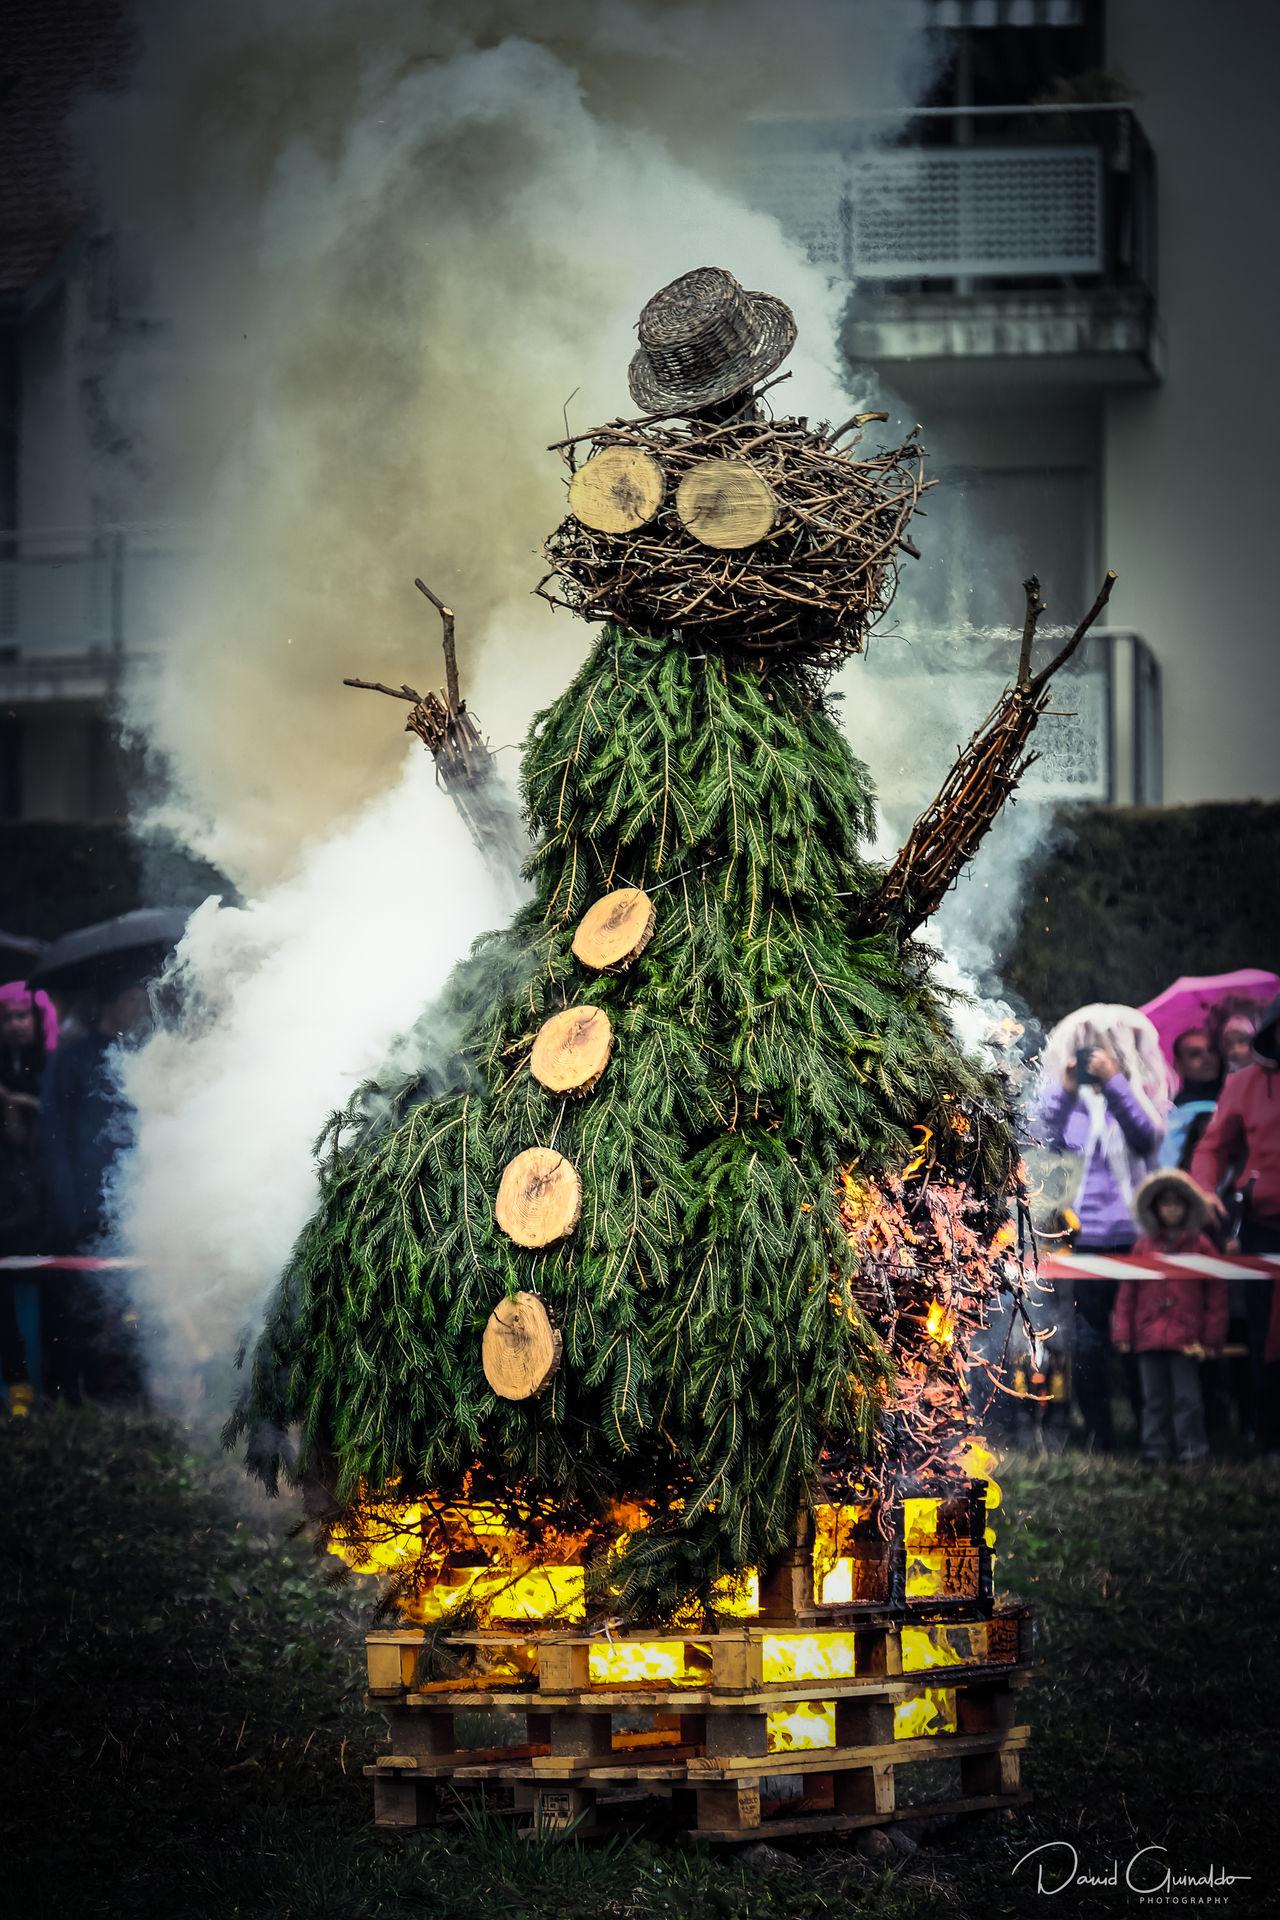 Burning Burning Winter Man Carnaval Fire Humanoid Outdoors Smoke Smoke - Physical Structure Winter